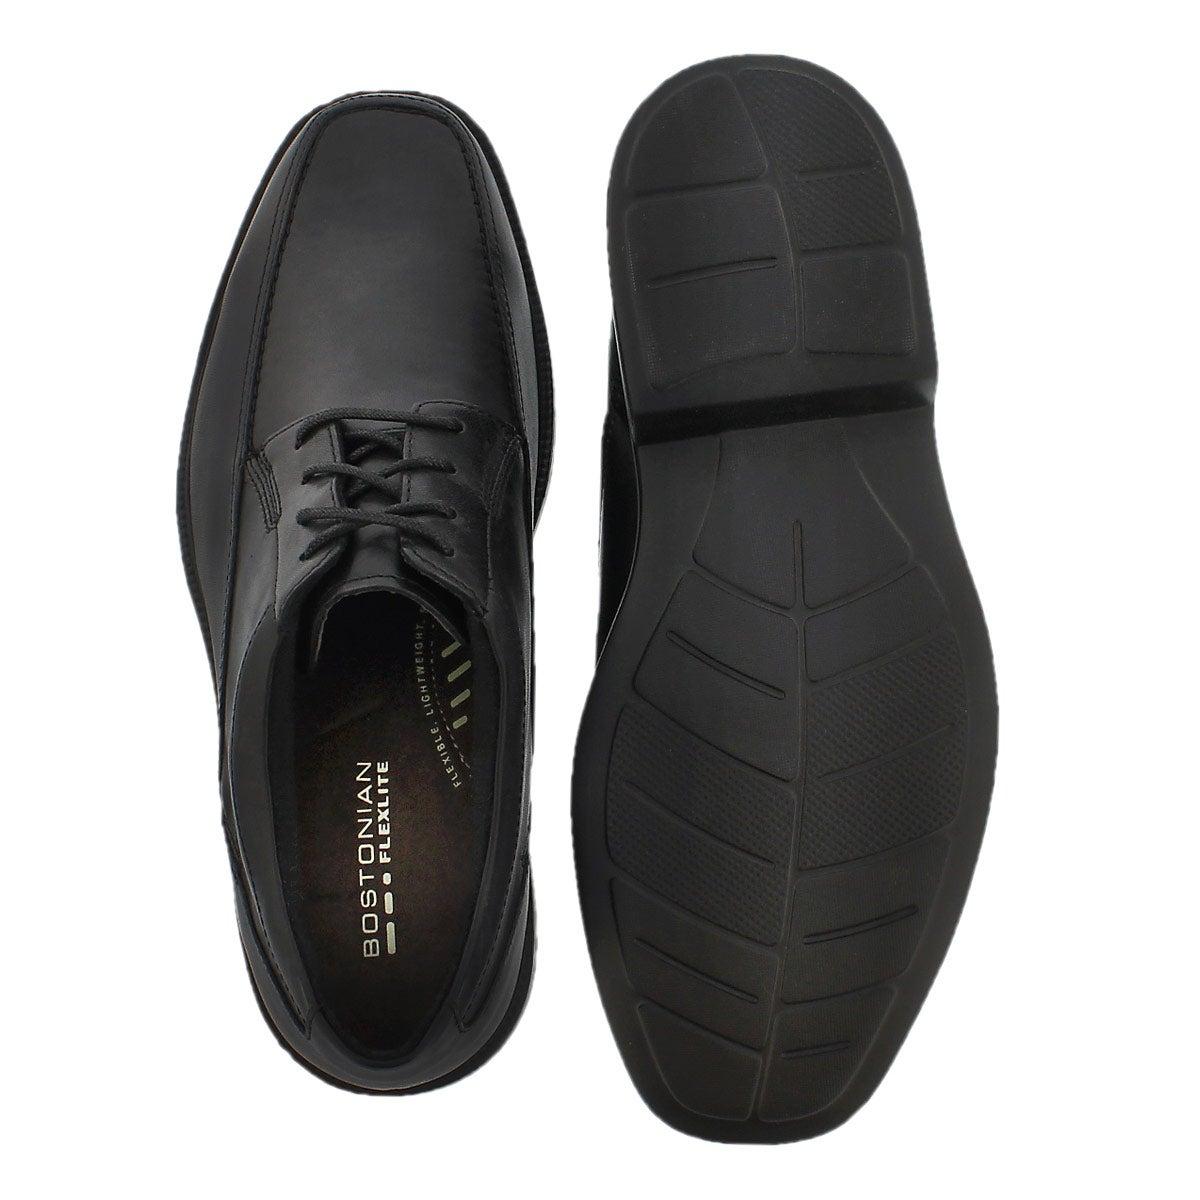 Mns Ipswitch black dress oxford